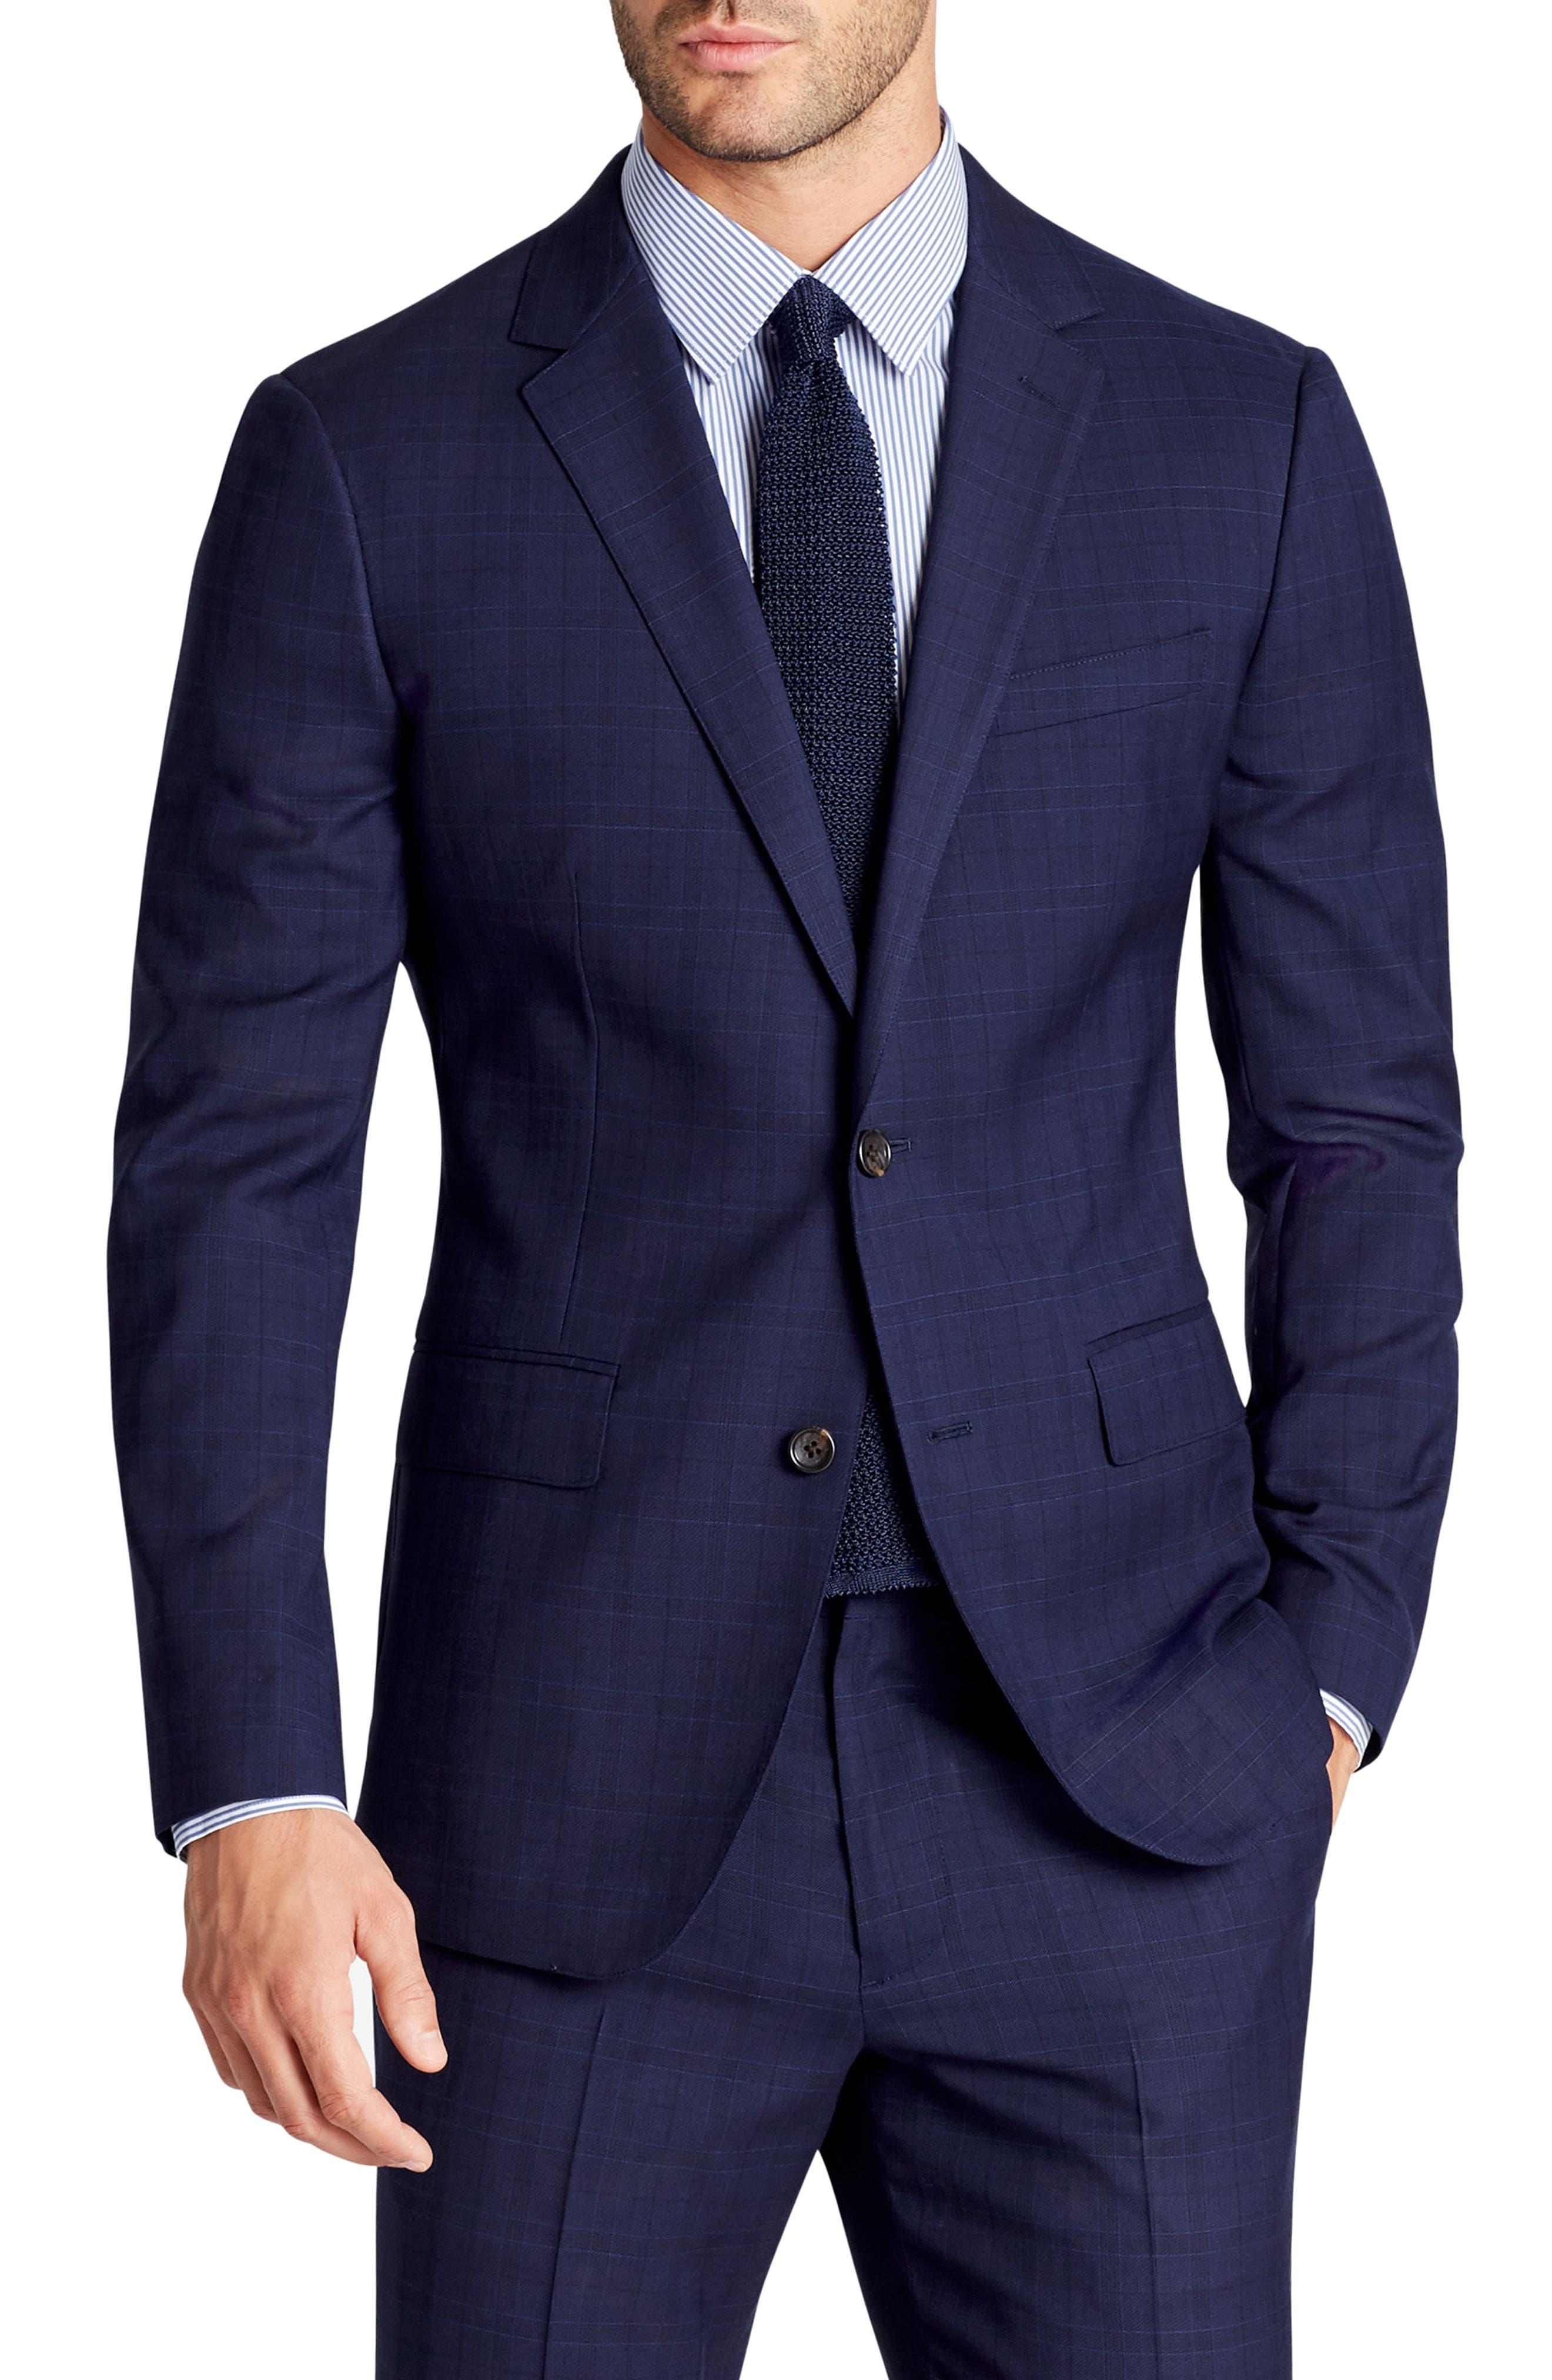 Jetsetter Slim Fit Plaid Stretch Wool Sport Coat,                         Main,                         color, Blue Plaid